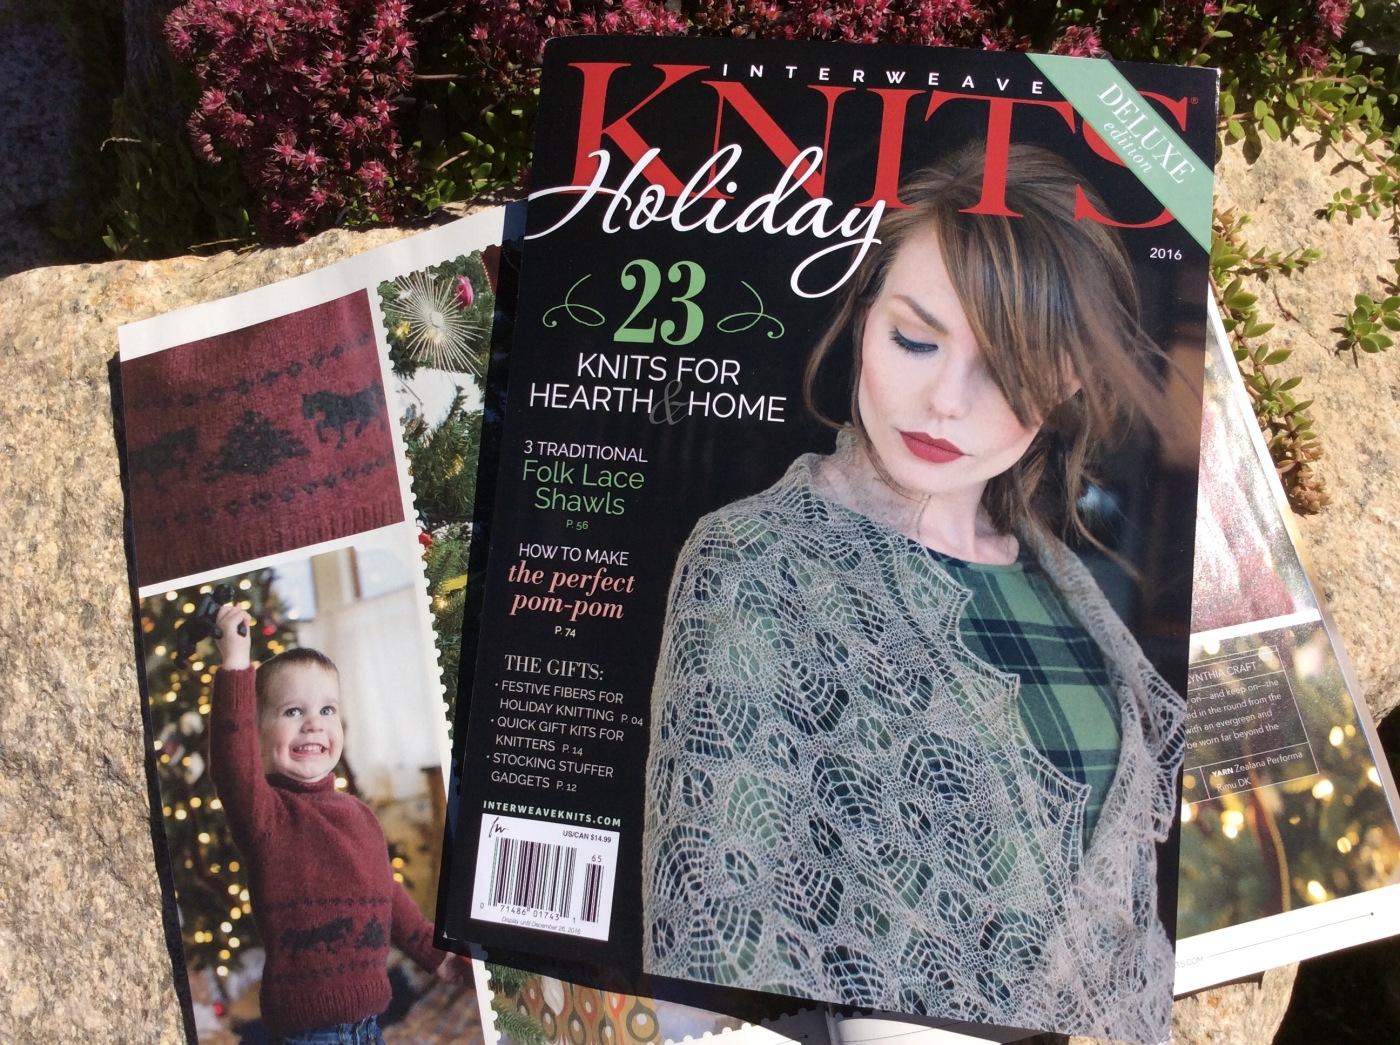 Interweave Holiday Knits 2016